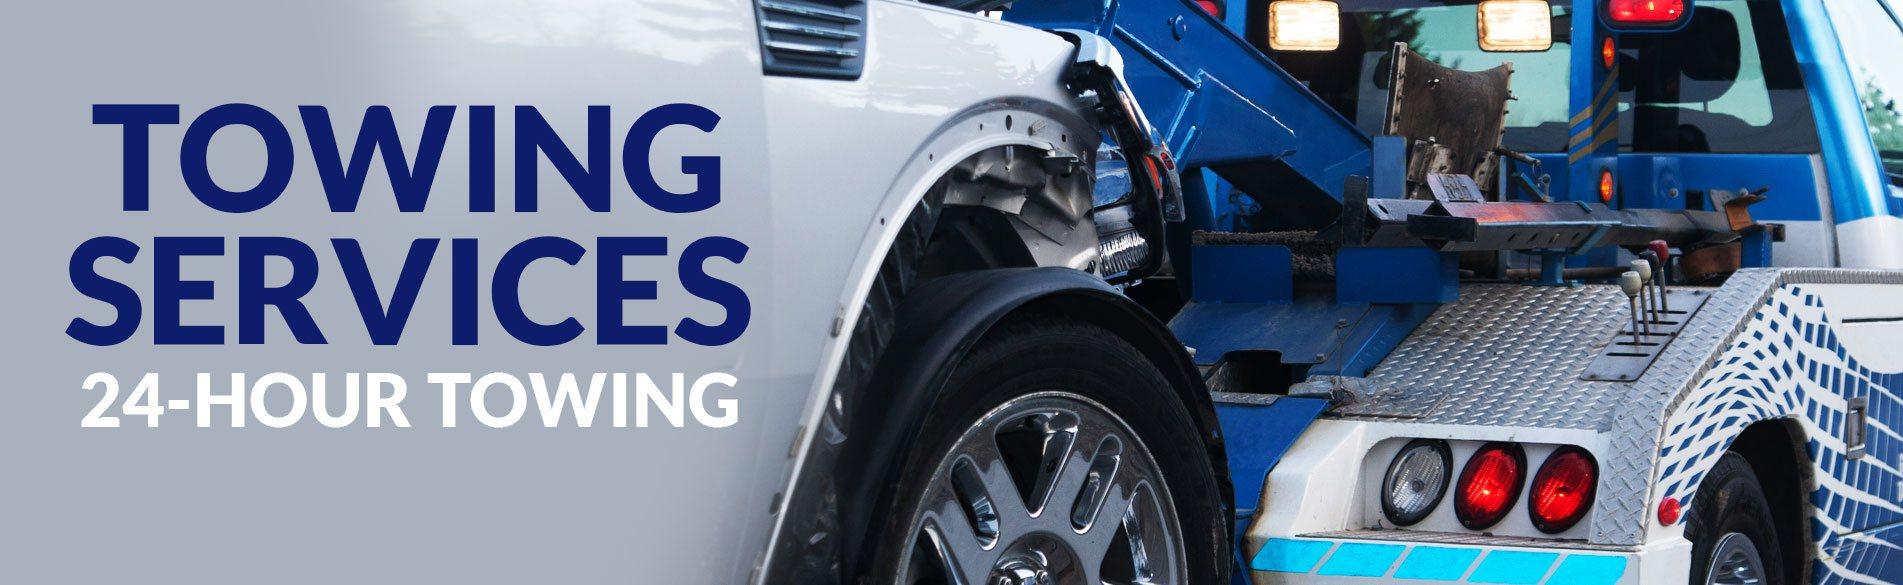 Used car dealer in williamson newark irondequoit for Wayne motor vehicle inspection hours